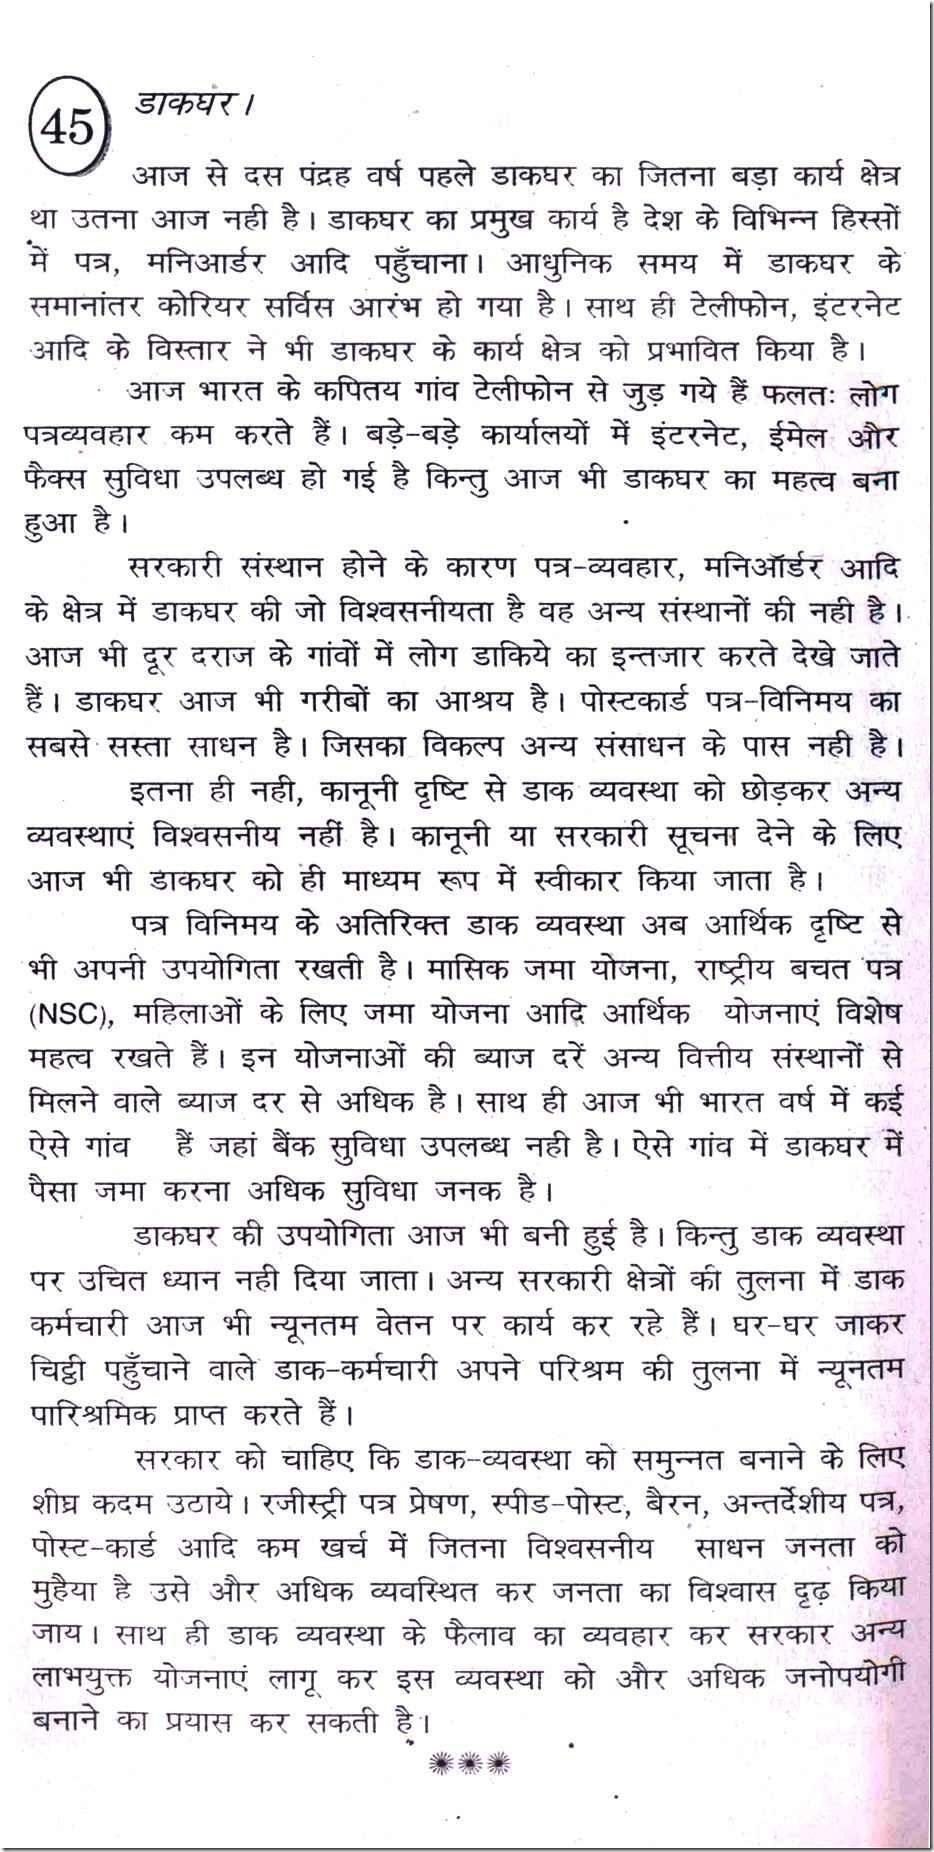 018 Hard Work Essay Example Wonderful Pdf Pays Off In Hindi Writing Full